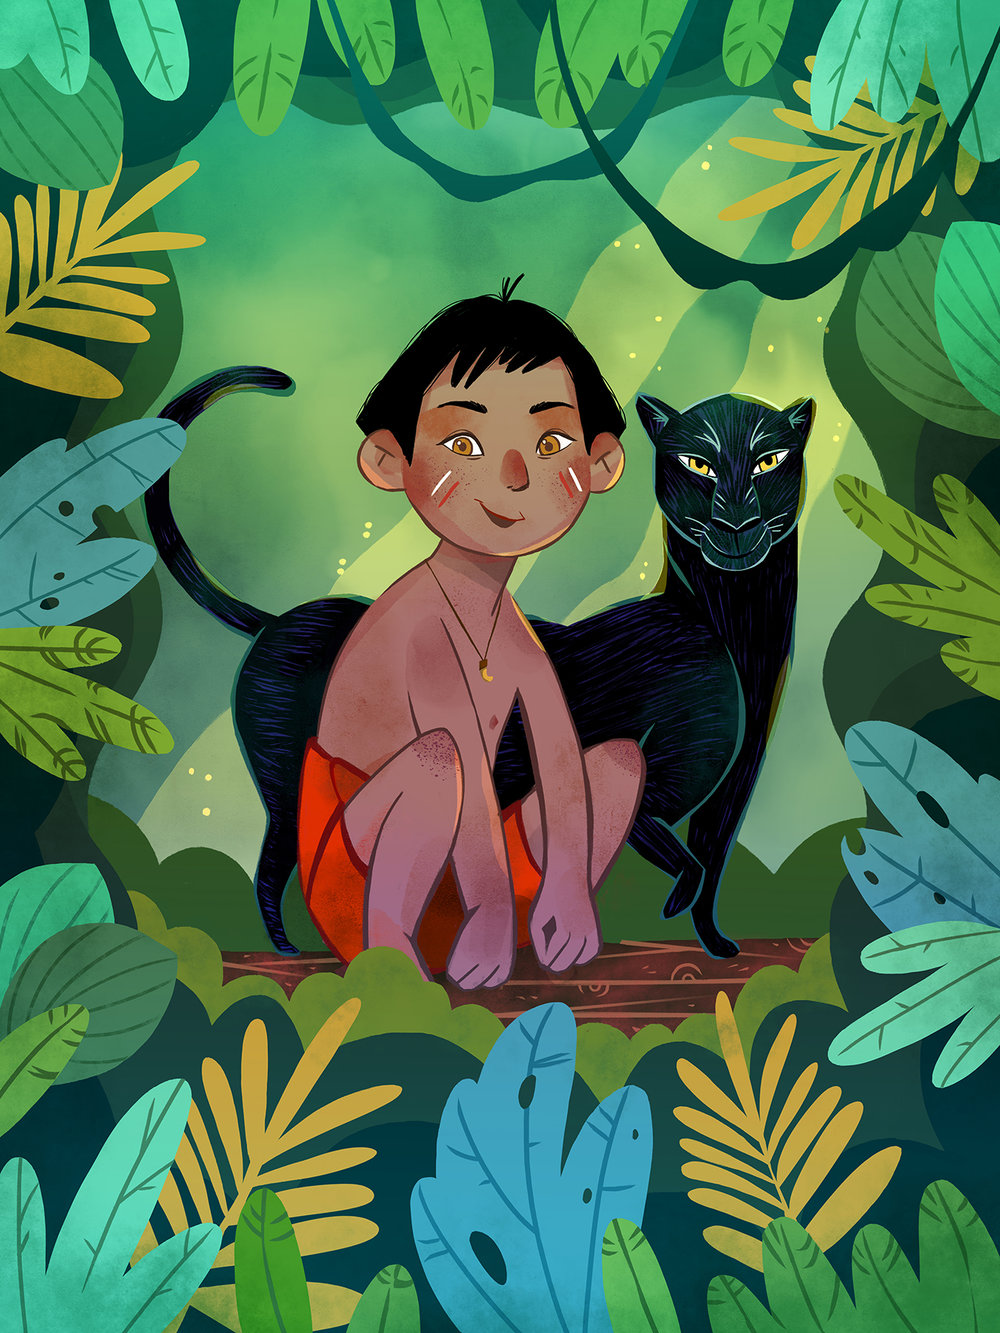 Mowgli by Èlia Meraki ©